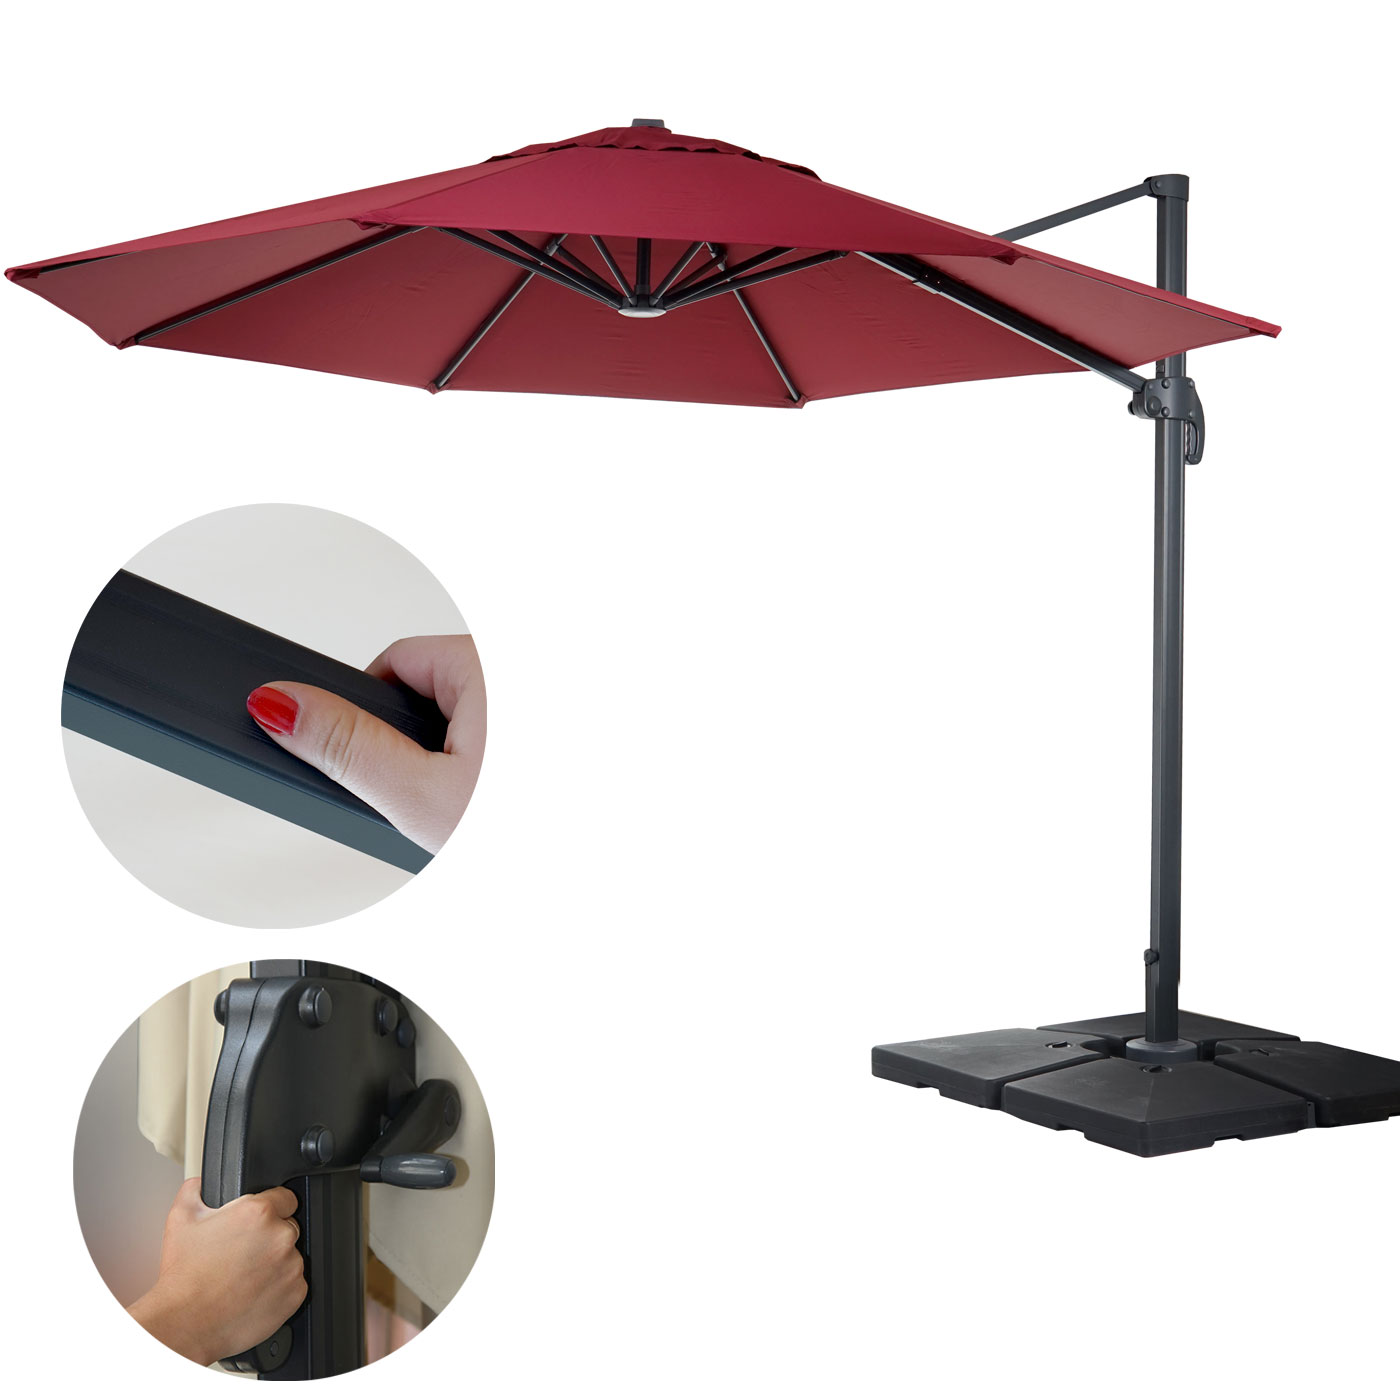 gastronomie ampelschirm n22 sonnenschirm rund 4m polyester alu stahl 27kg bordeaux mit st nder. Black Bedroom Furniture Sets. Home Design Ideas